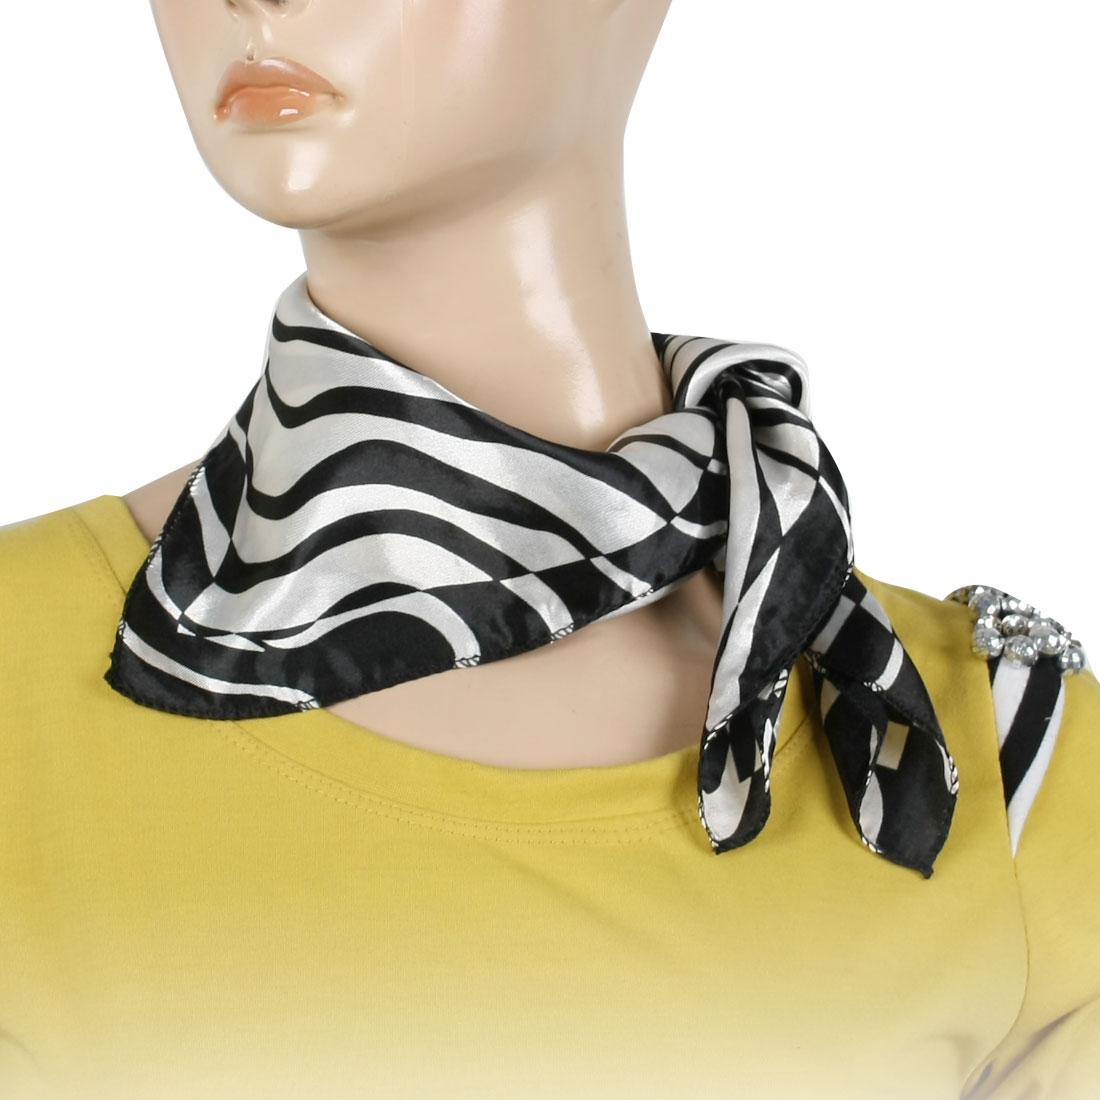 Black White Zebra Pattern Square Neck Scarf Wrap Neckerchief for Women